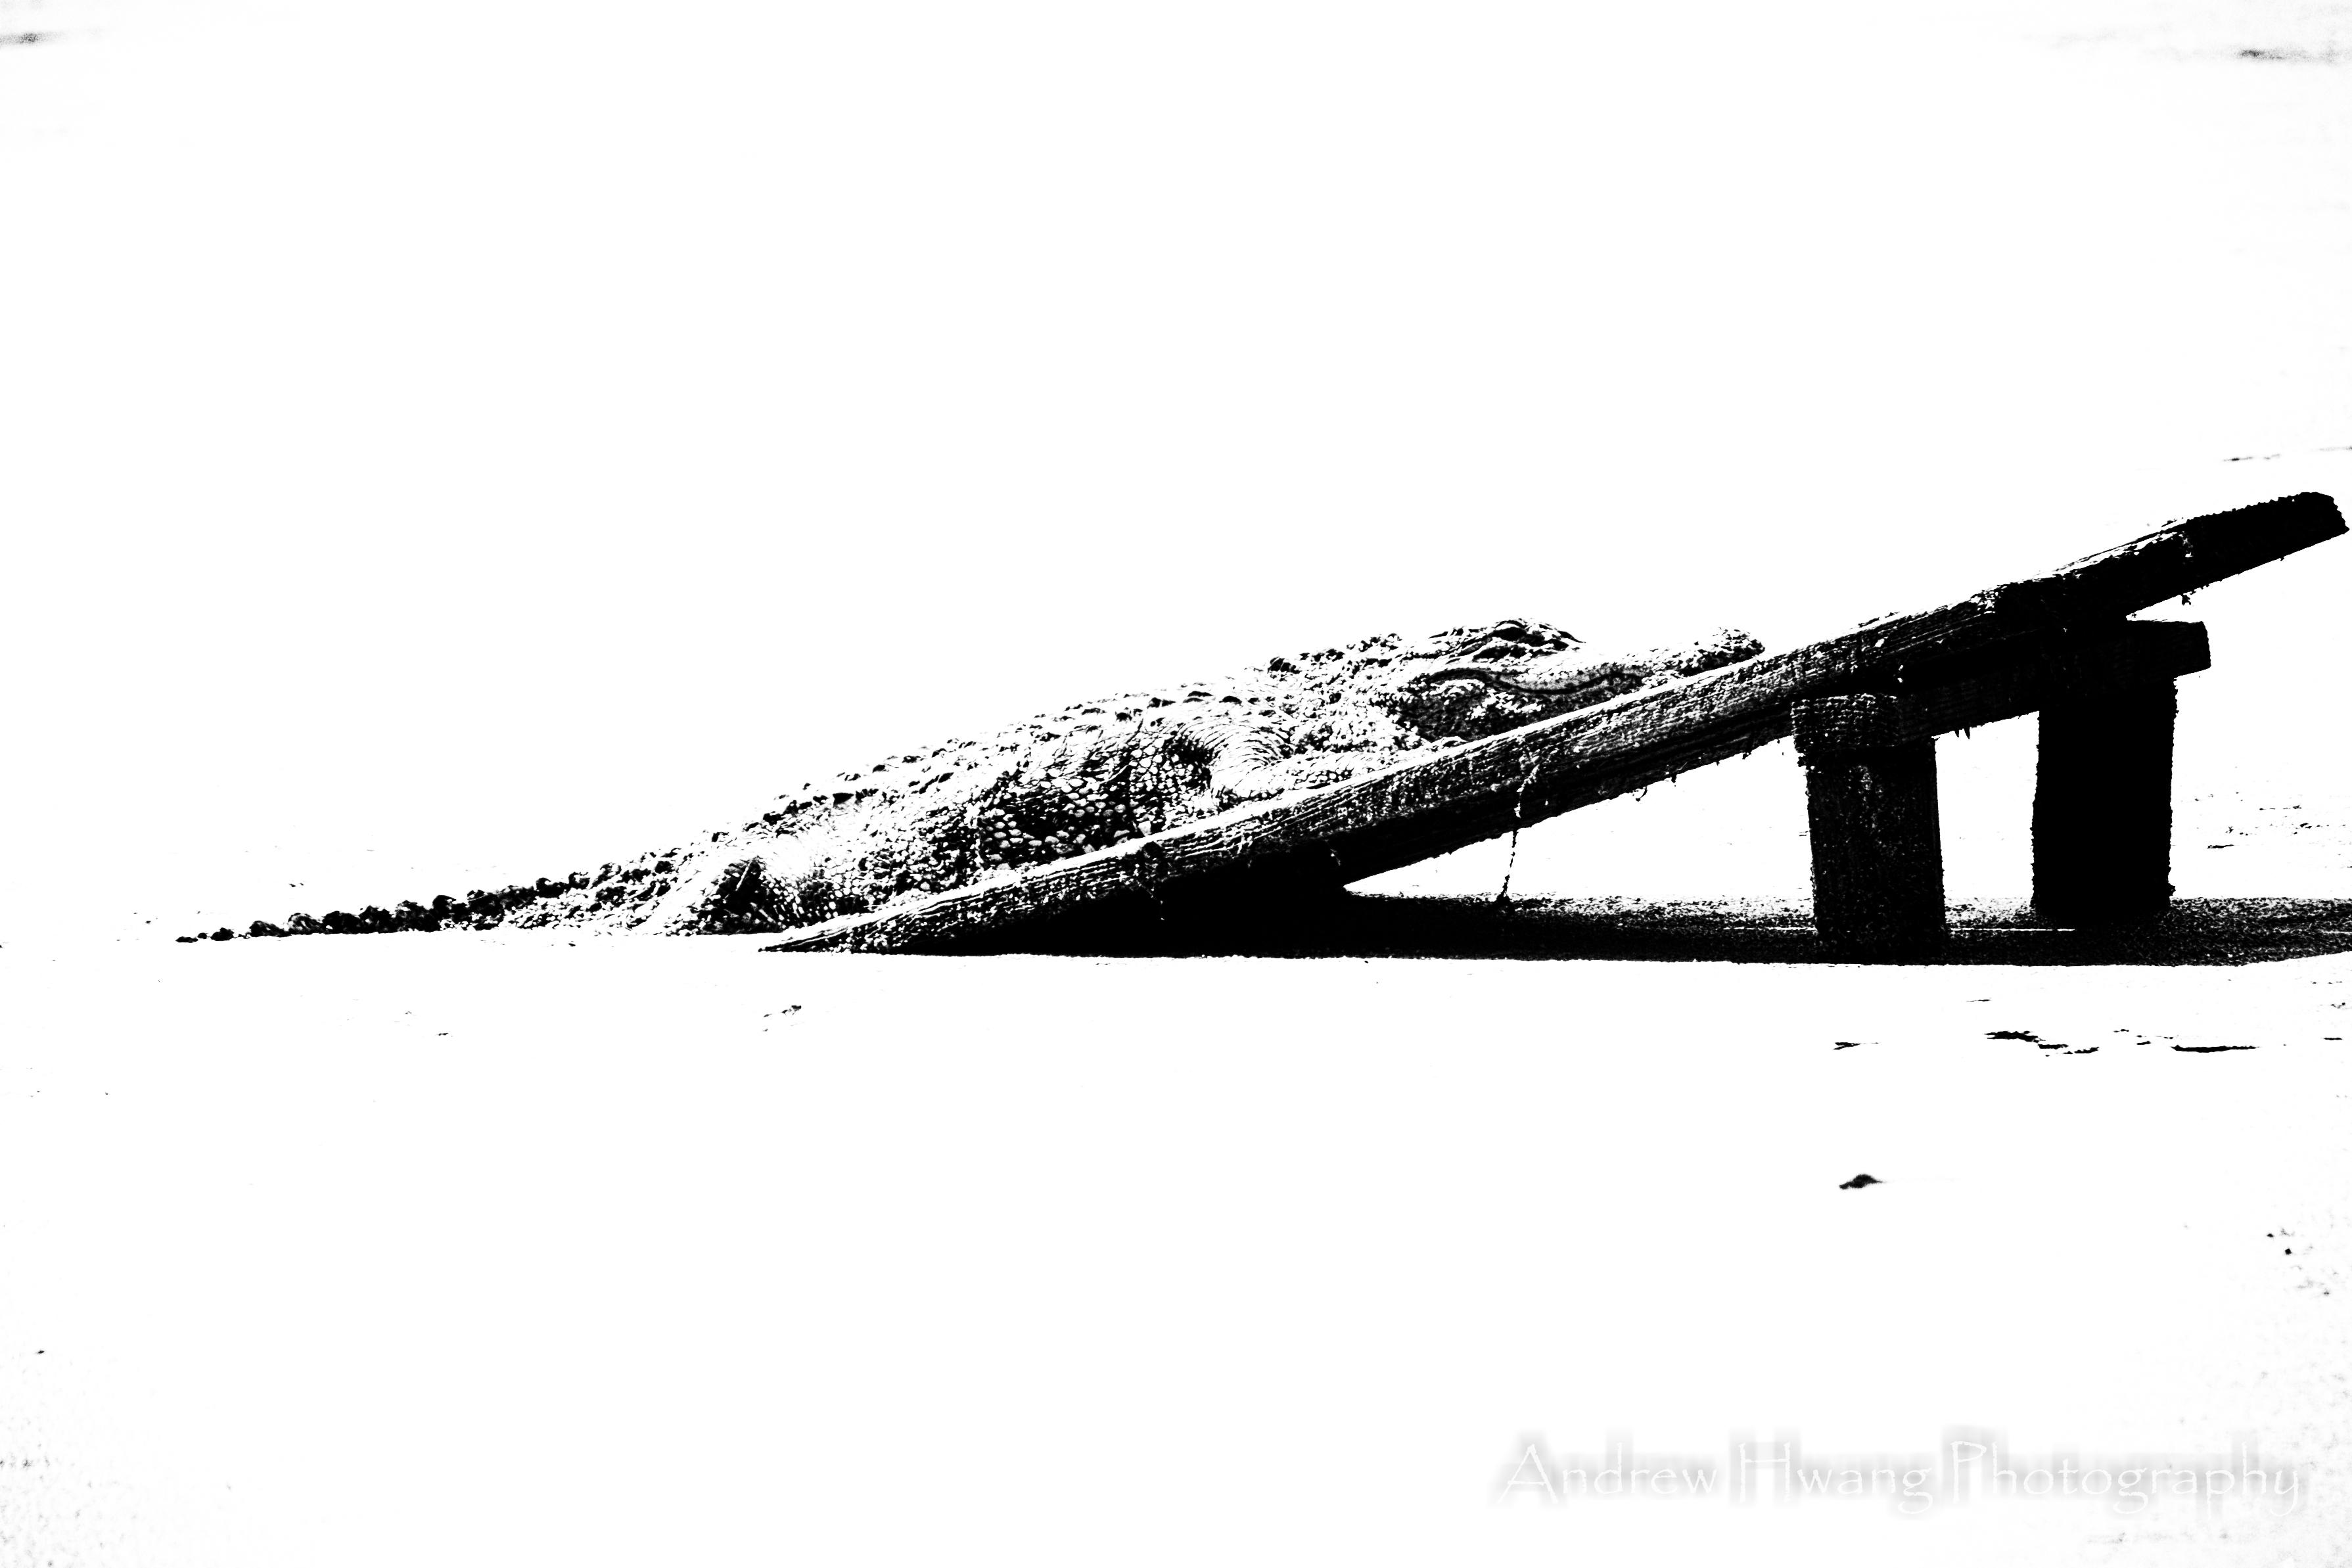 Audubon Swamp Gator B&W